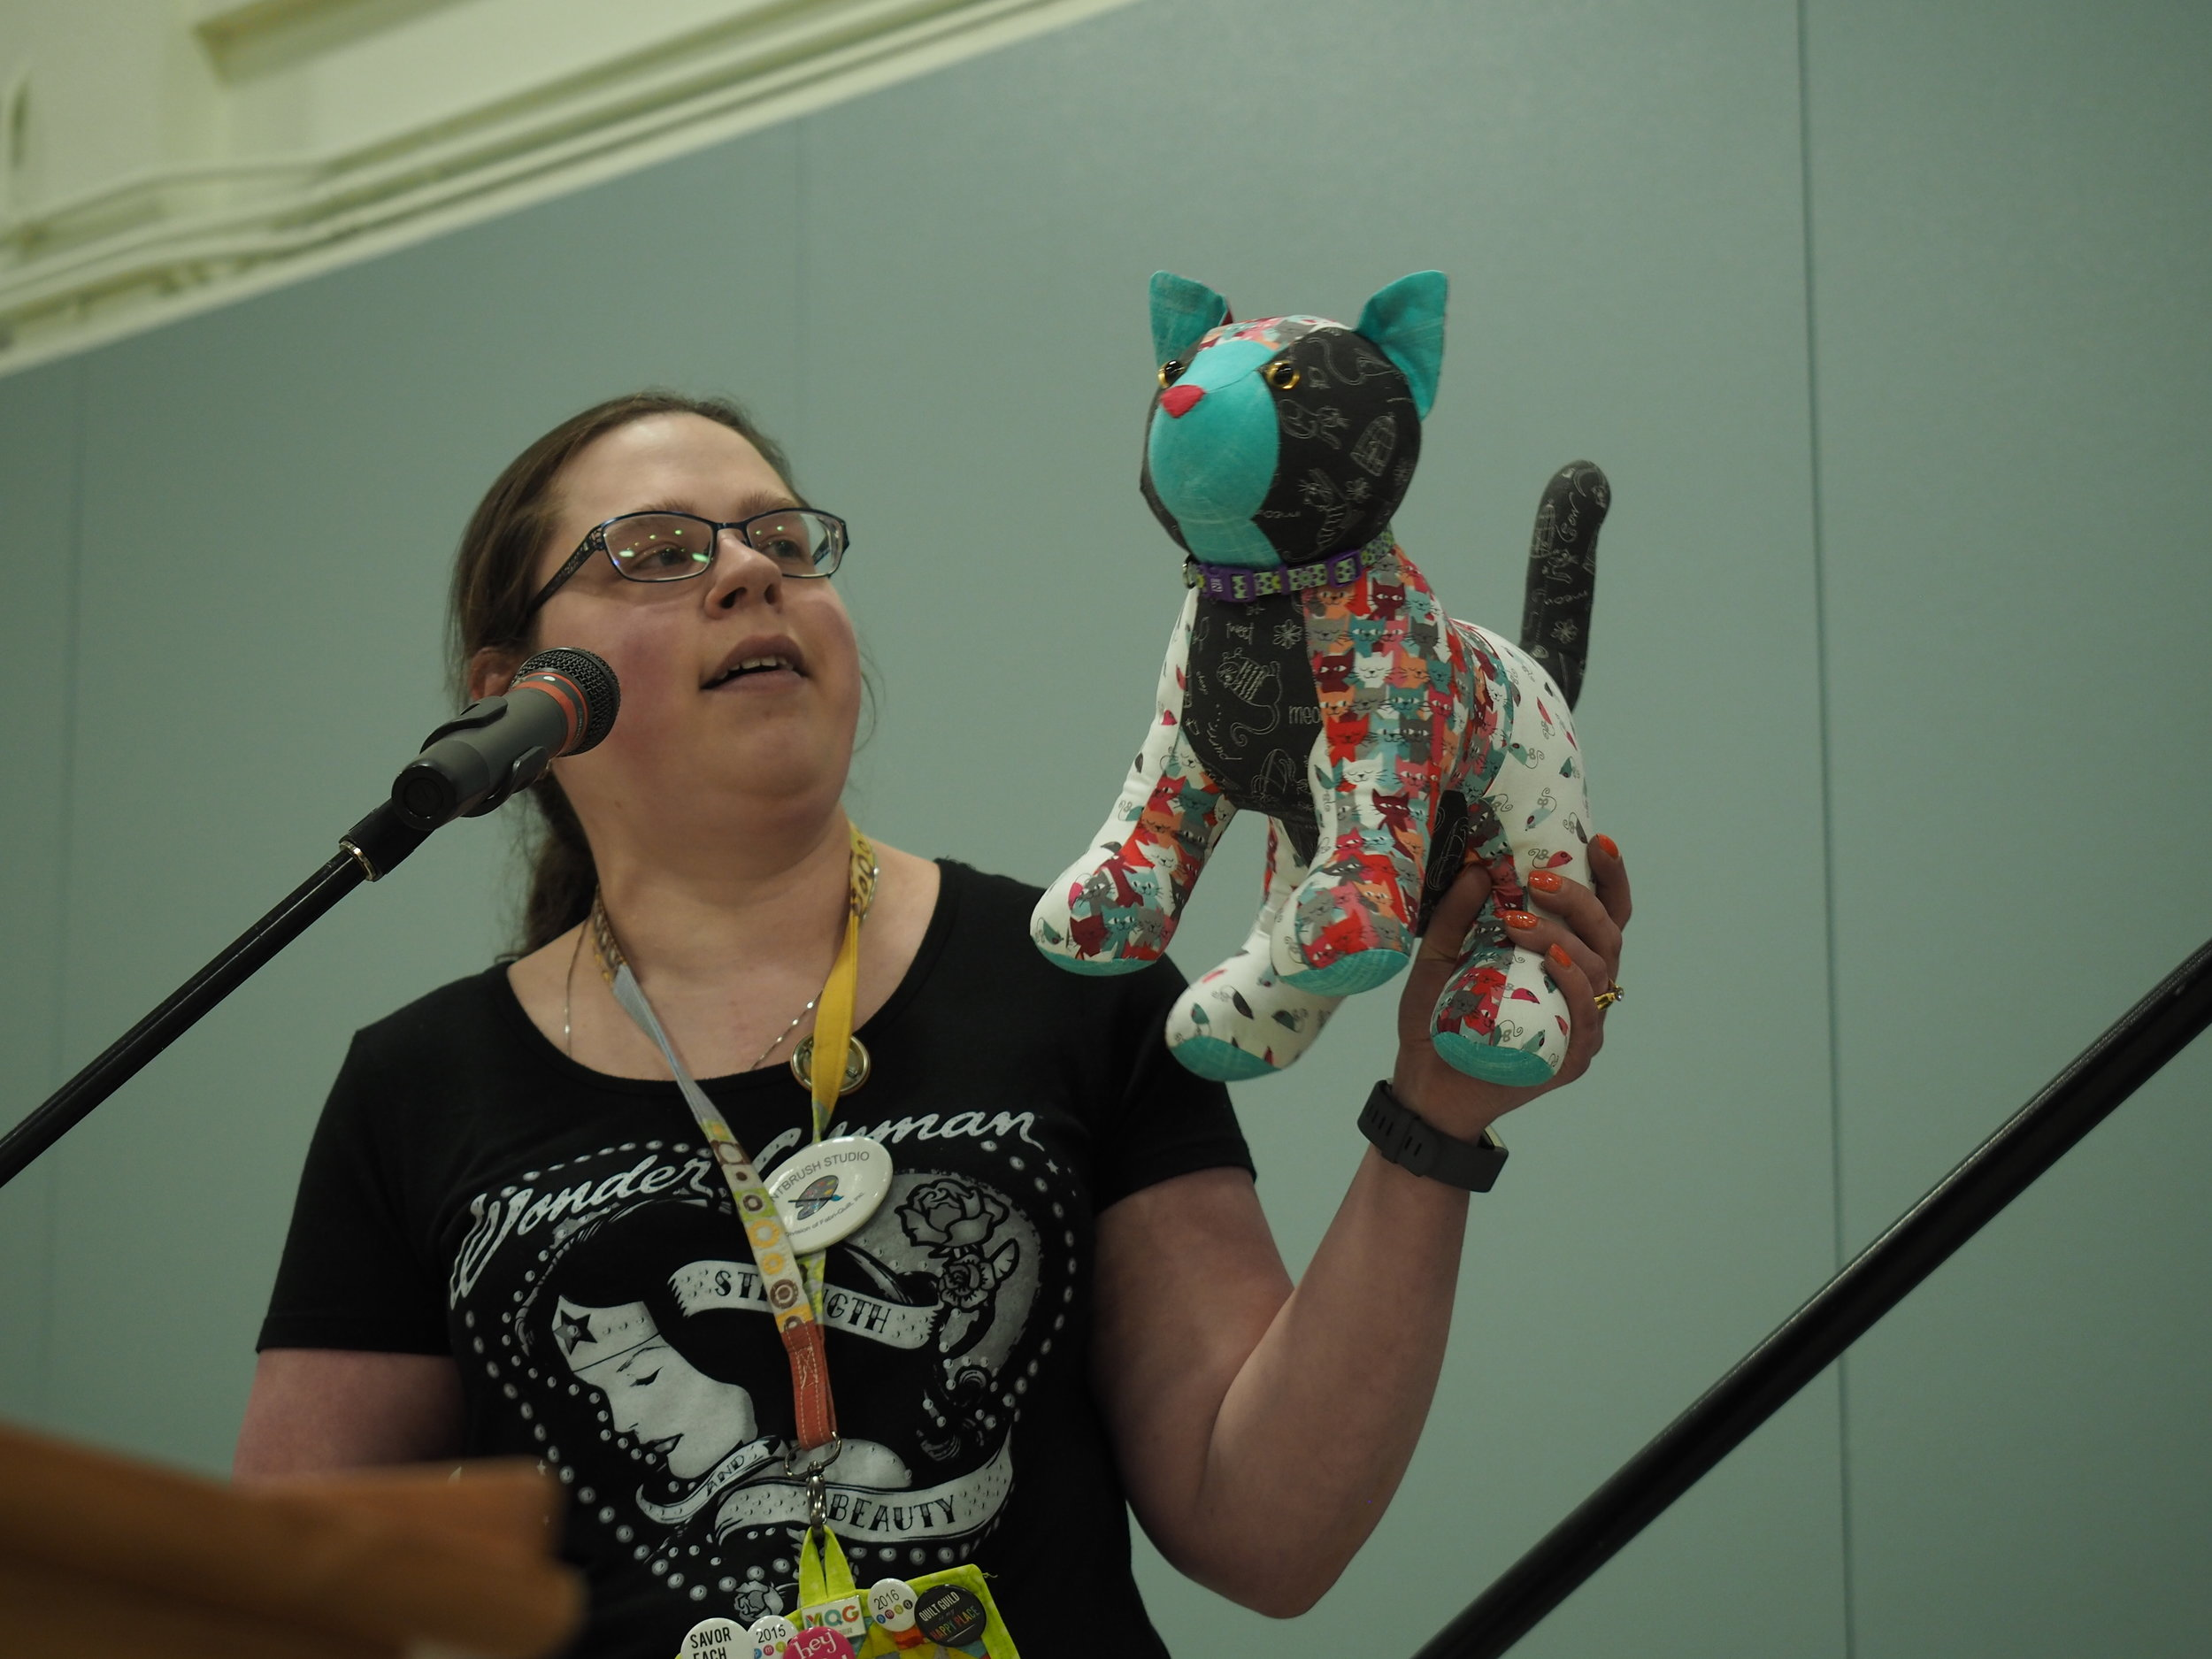 Cat toy by Jennifer Gleich